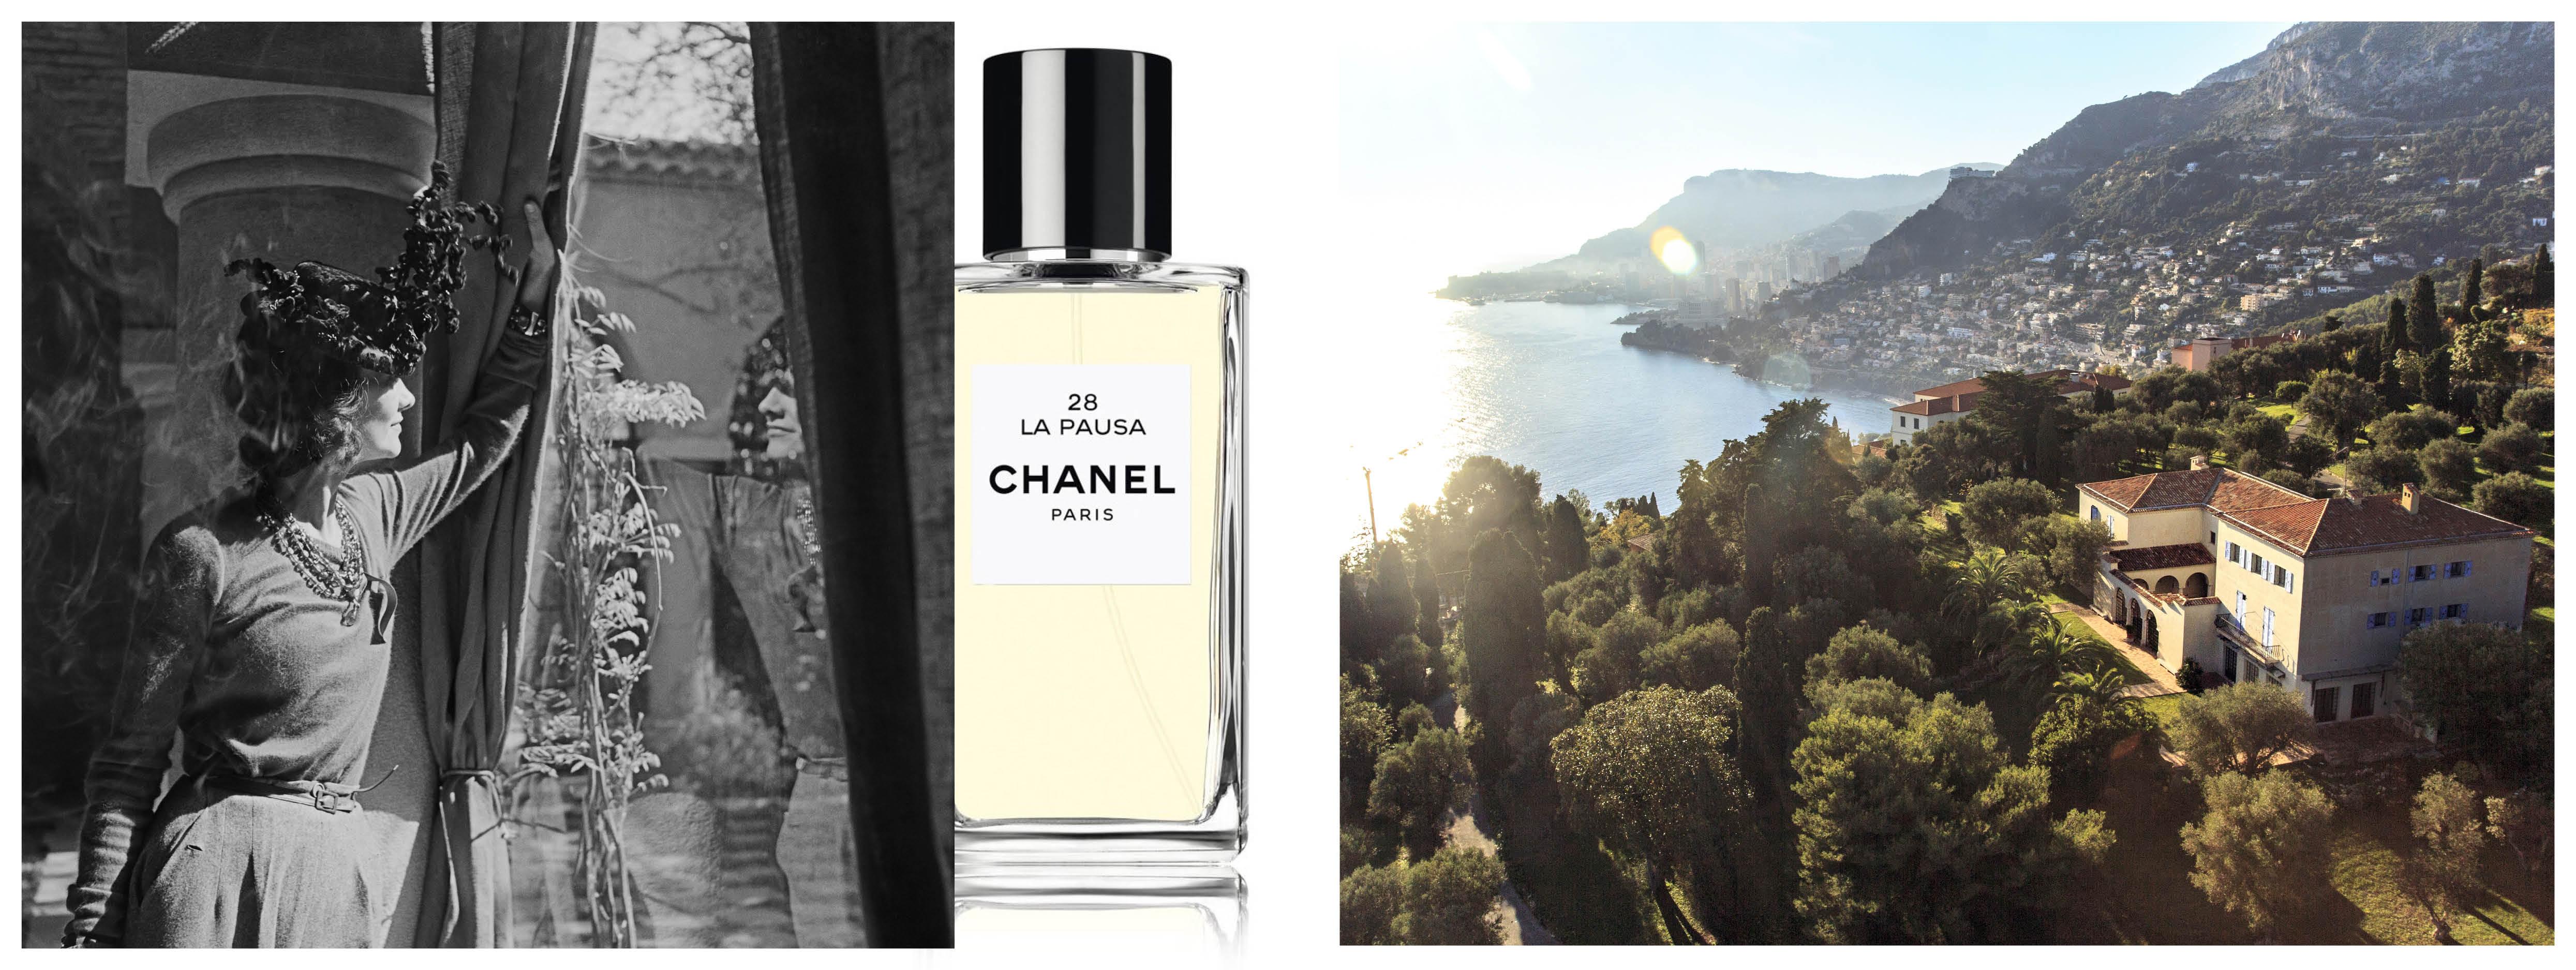 Carrusel La Pausa, Chanel.